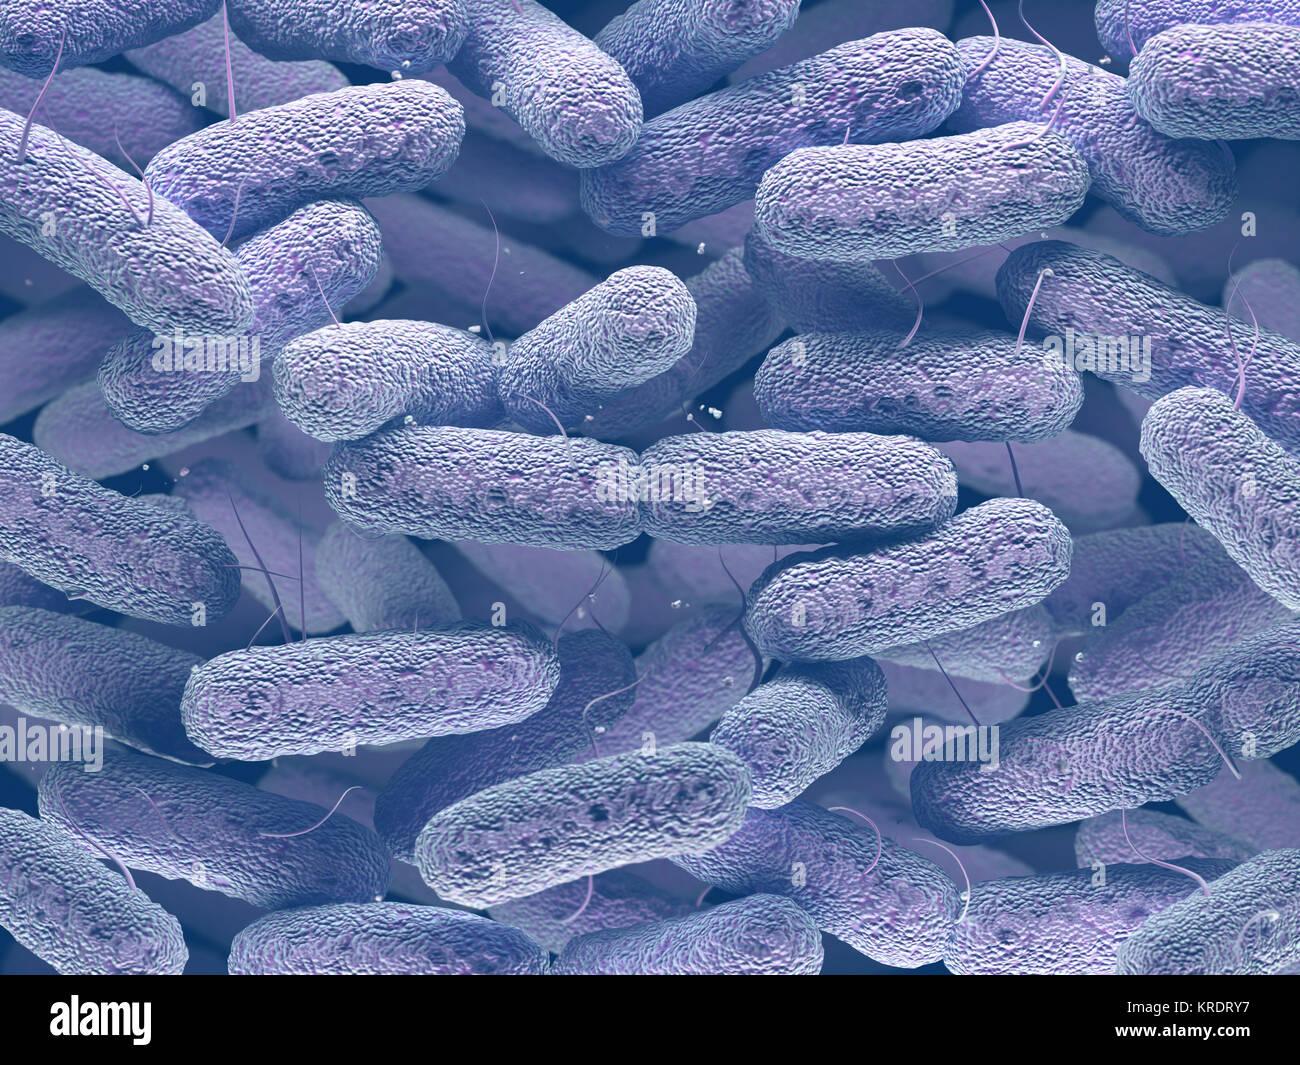 Enterobacteriaceae Bacteria Family - Stock Image